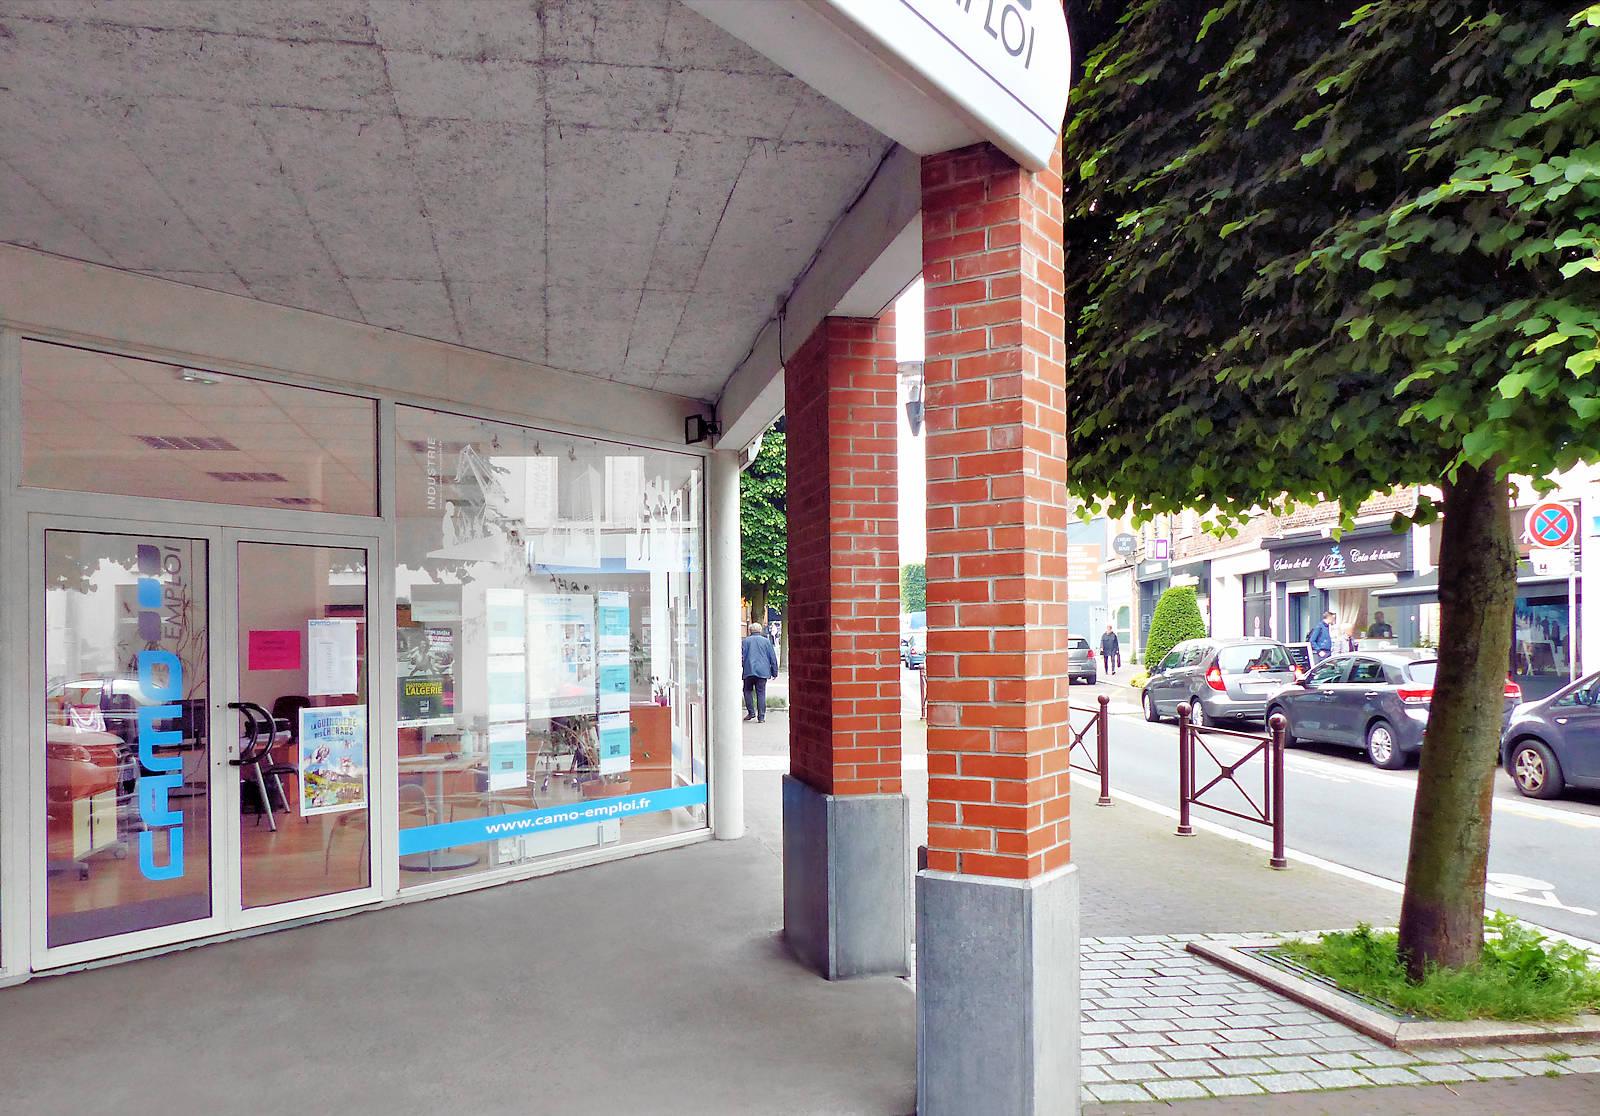 Agence CAMO Emploi - Rue de la Cloche, Tourcoing